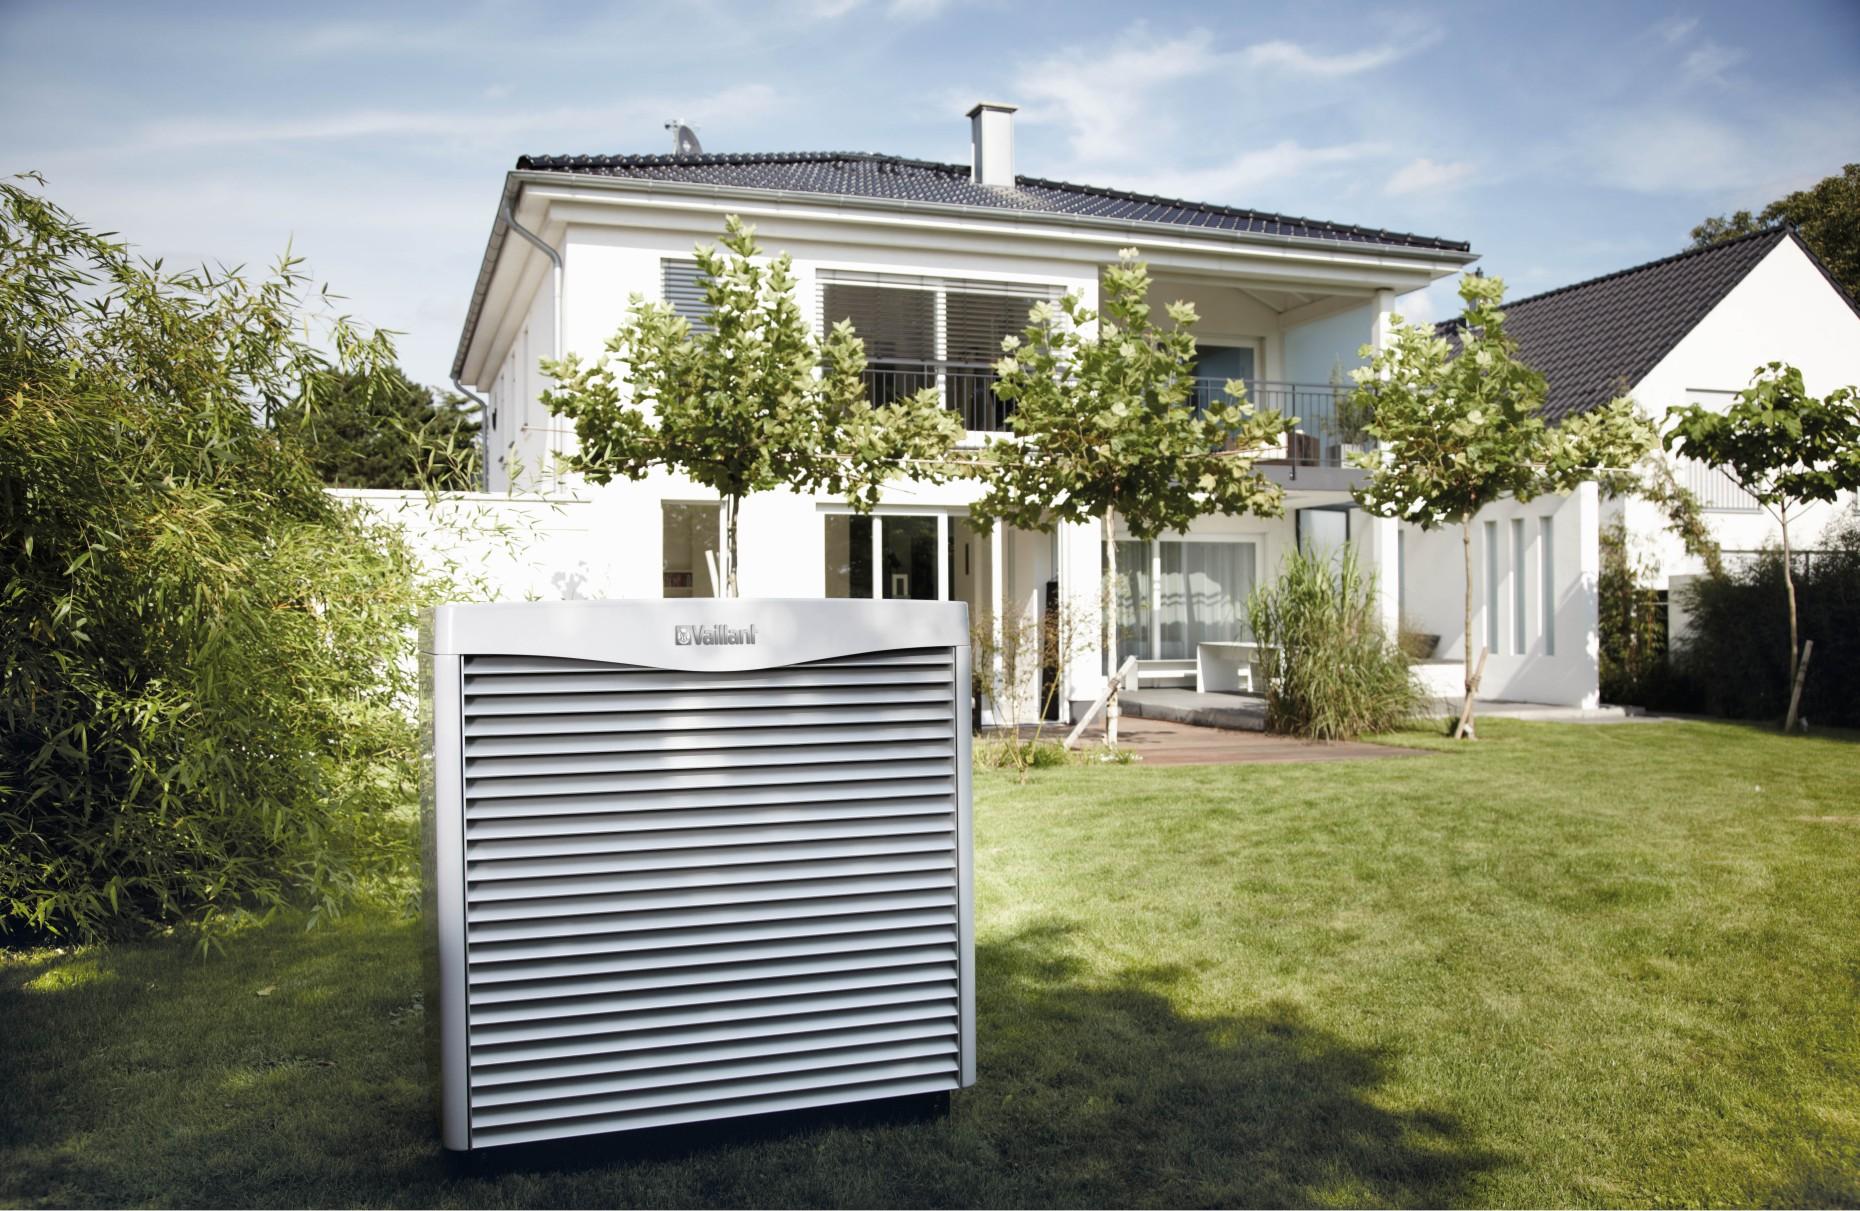 lucht water warmtepomp geotherm vwl s vaillant. Black Bedroom Furniture Sets. Home Design Ideas